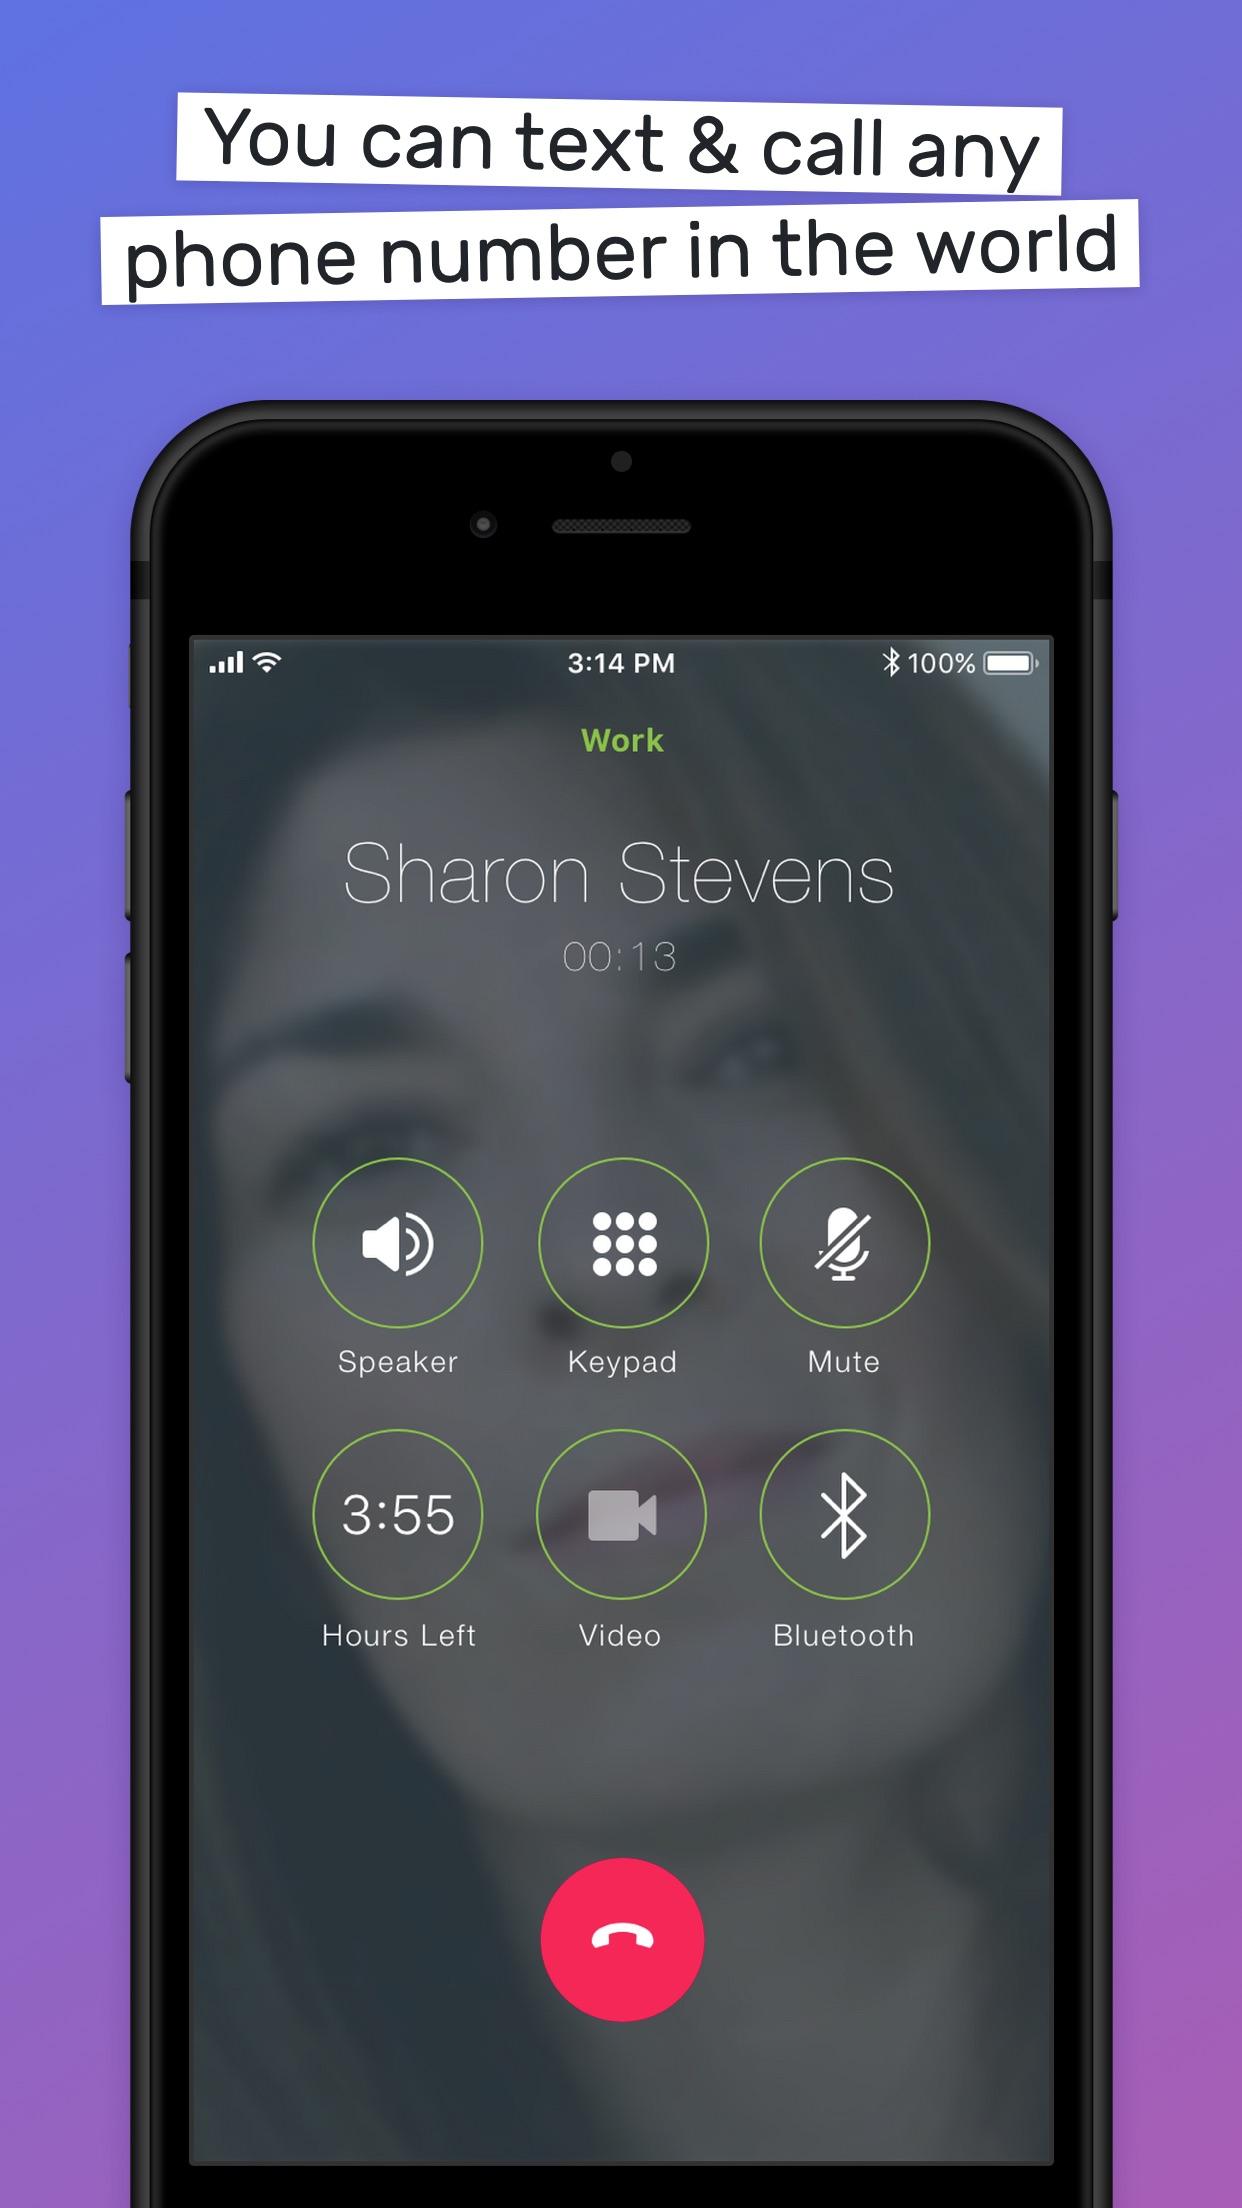 TextMe Up  Second Phone Number Screenshot